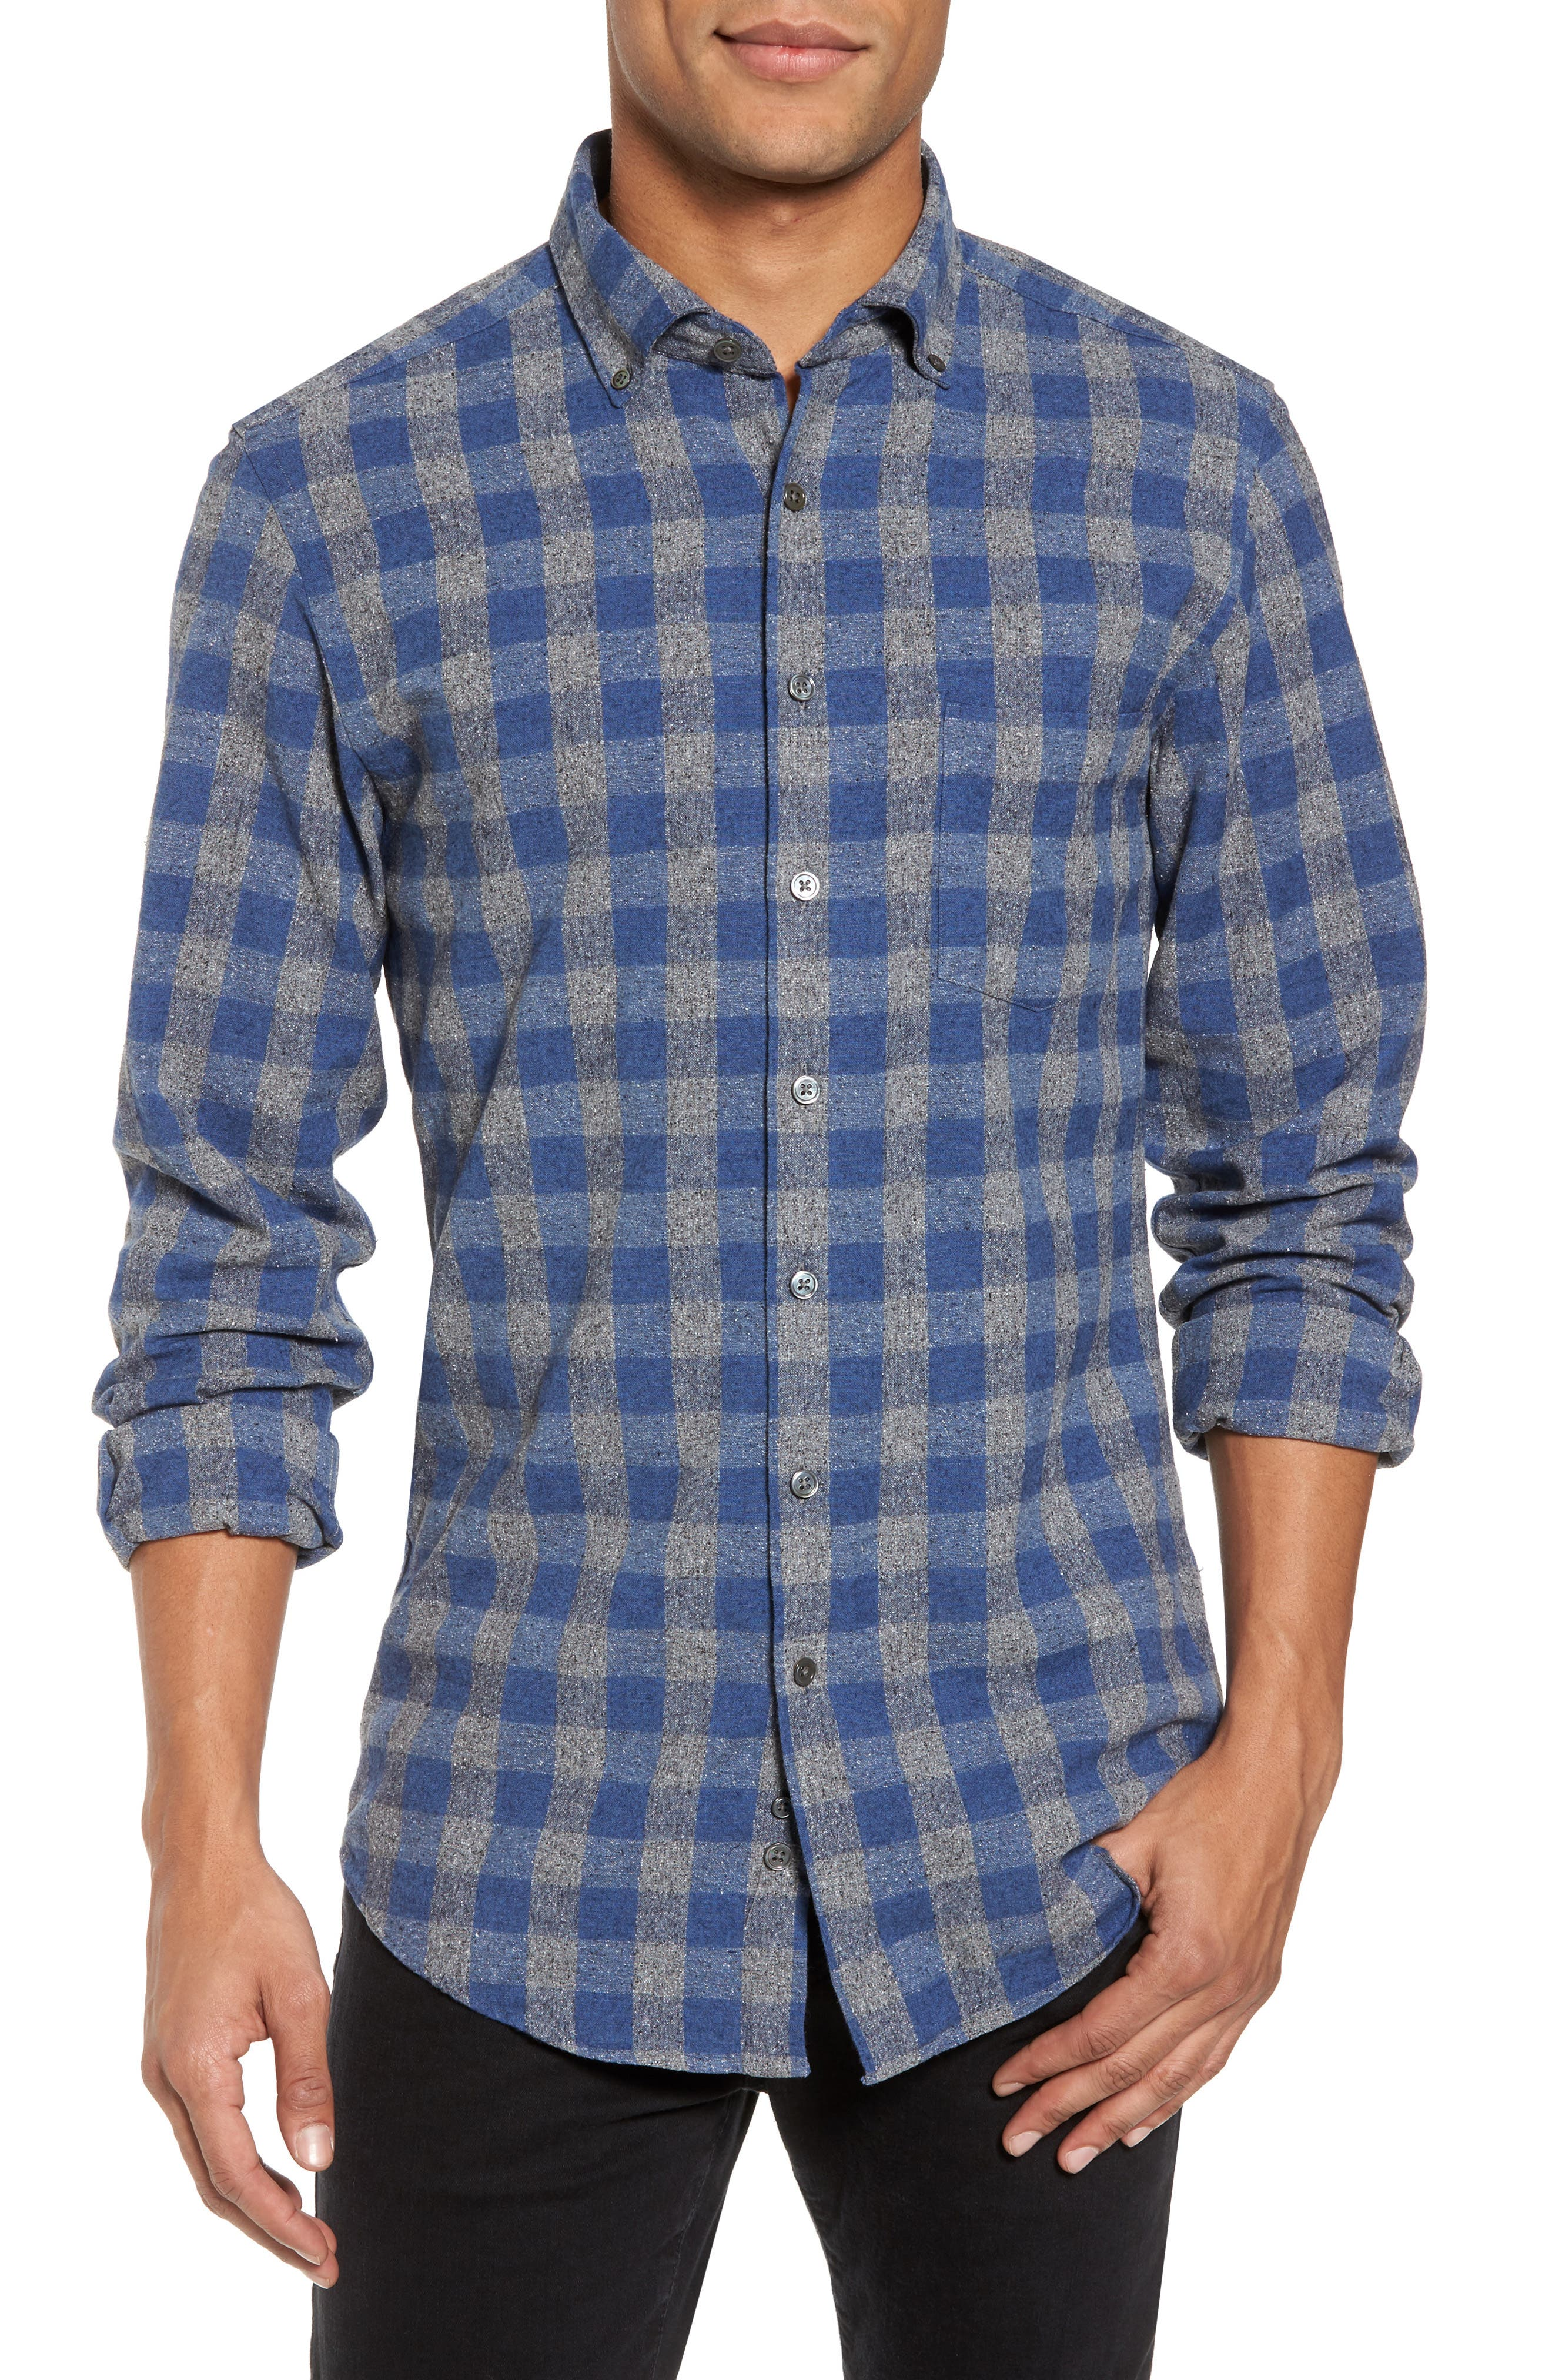 Alternate Image 1 Selected - Rodd & Gunn Avon River Sports Fit Check Flannel Shirt